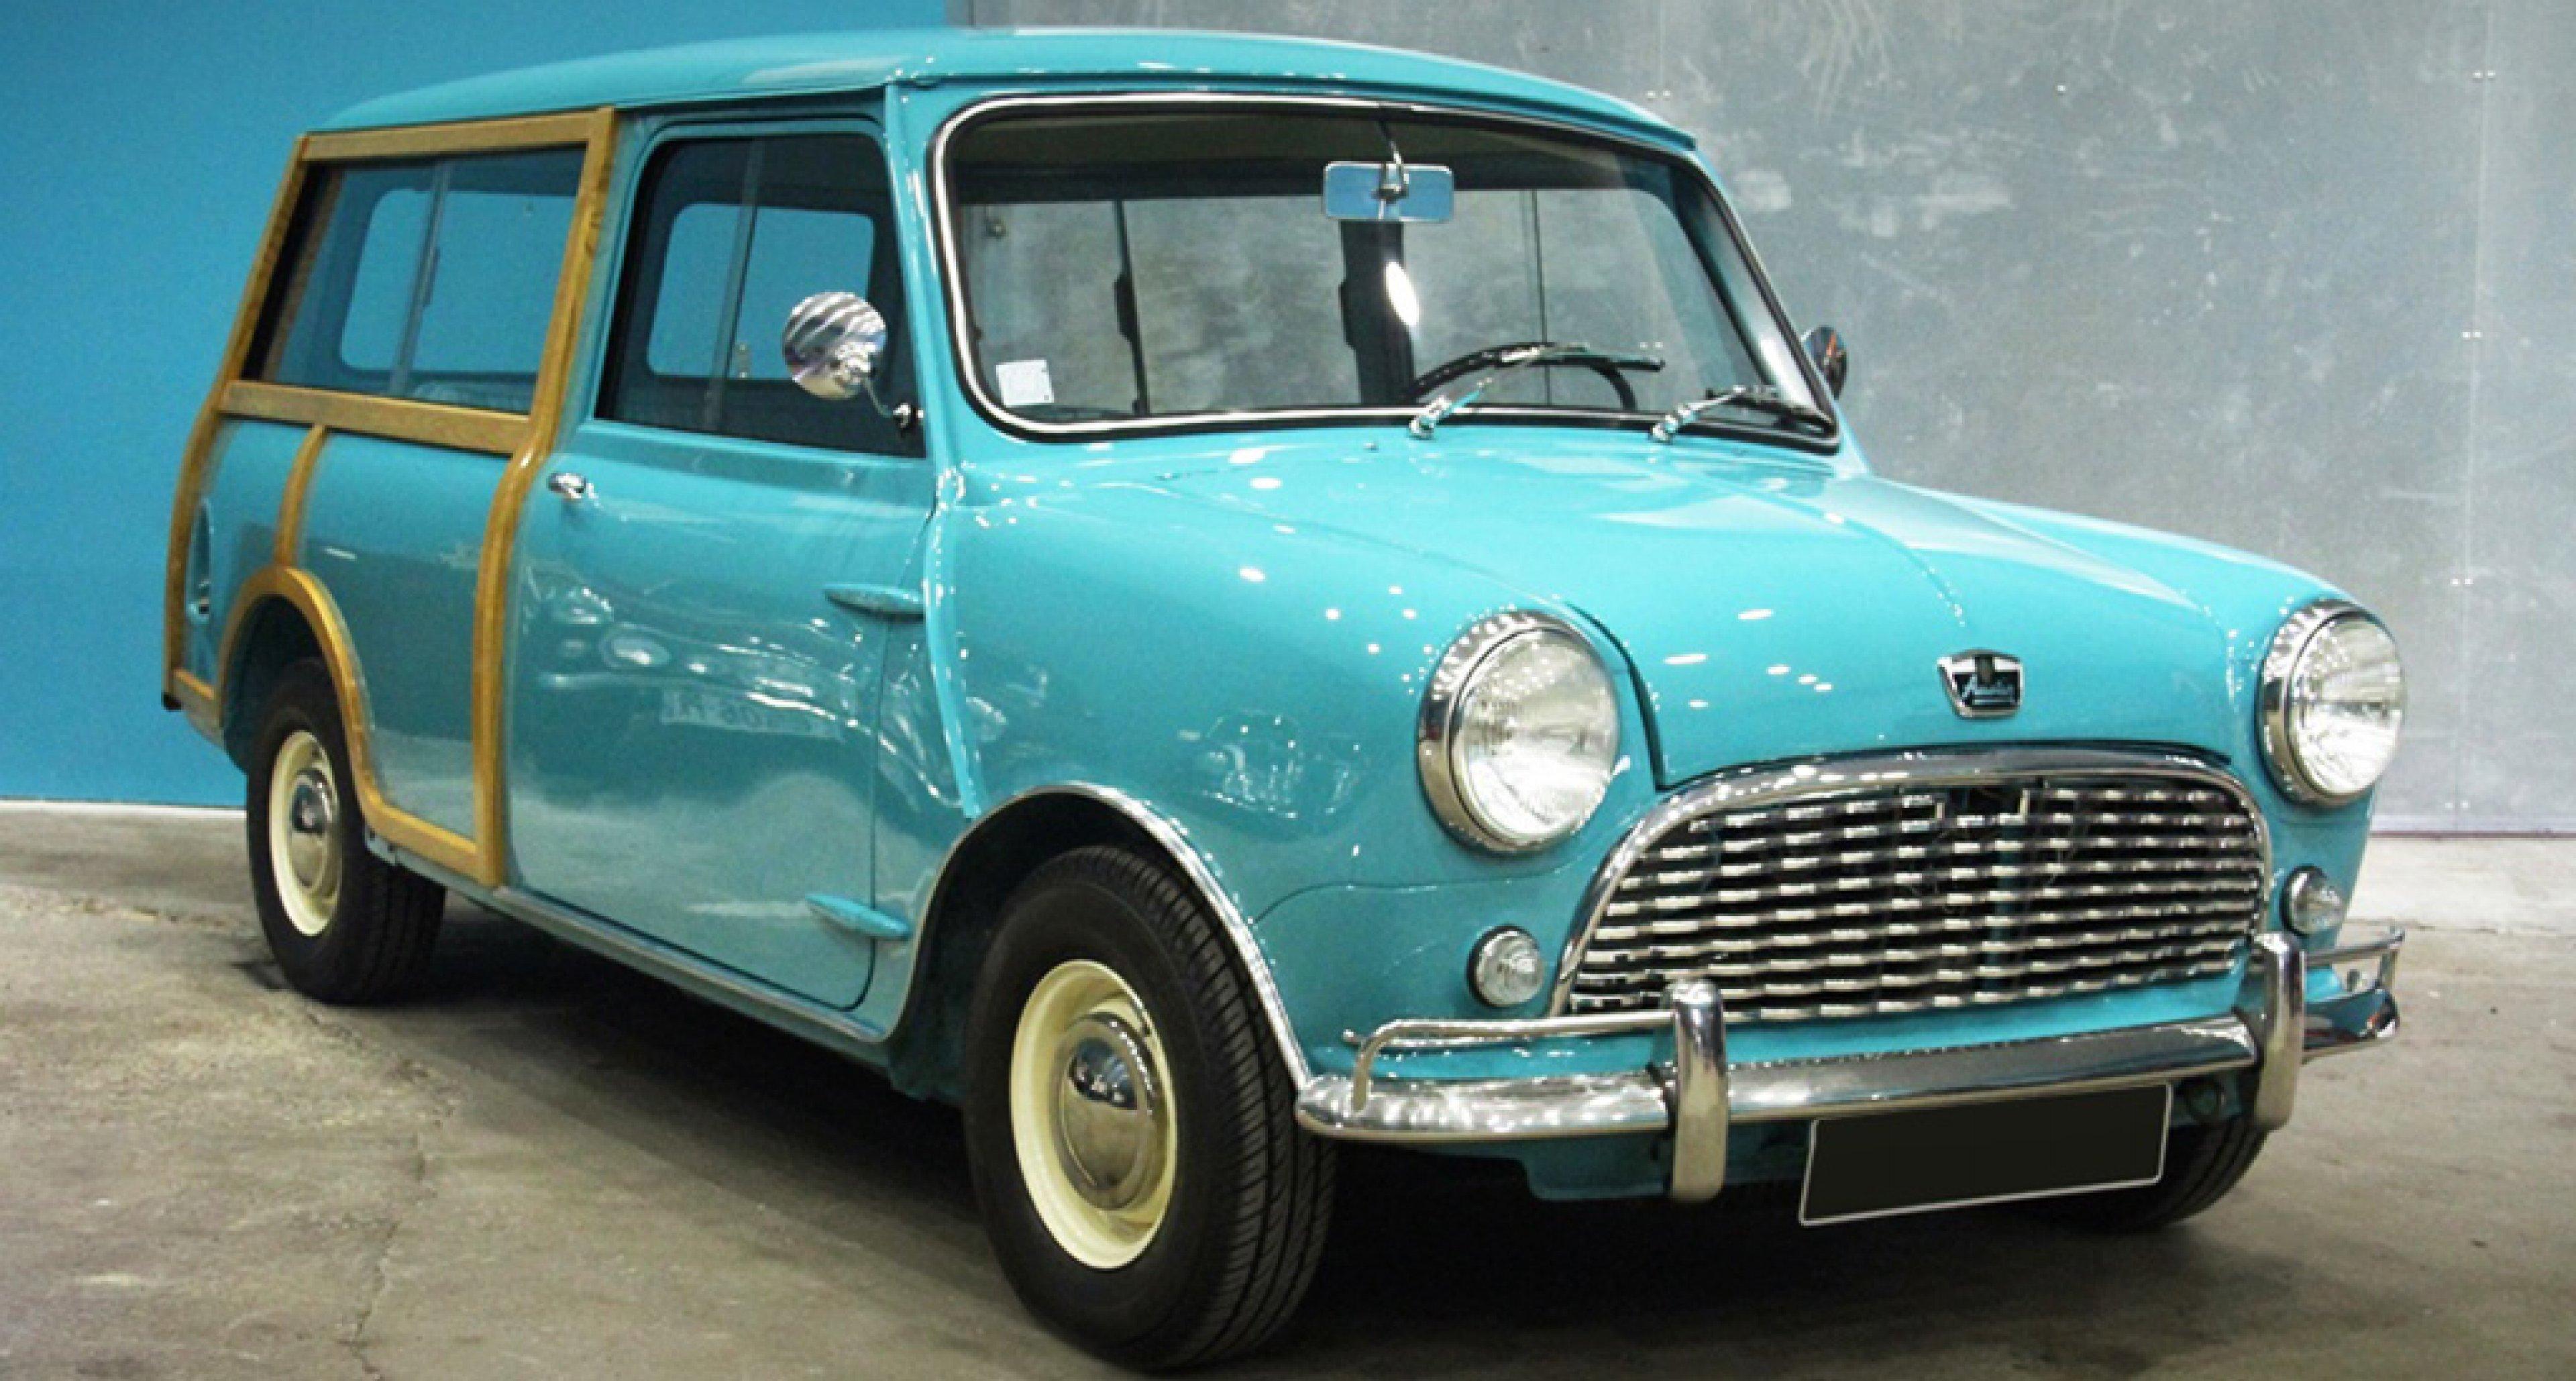 1965 Austin Mini - Countryman Mark 1